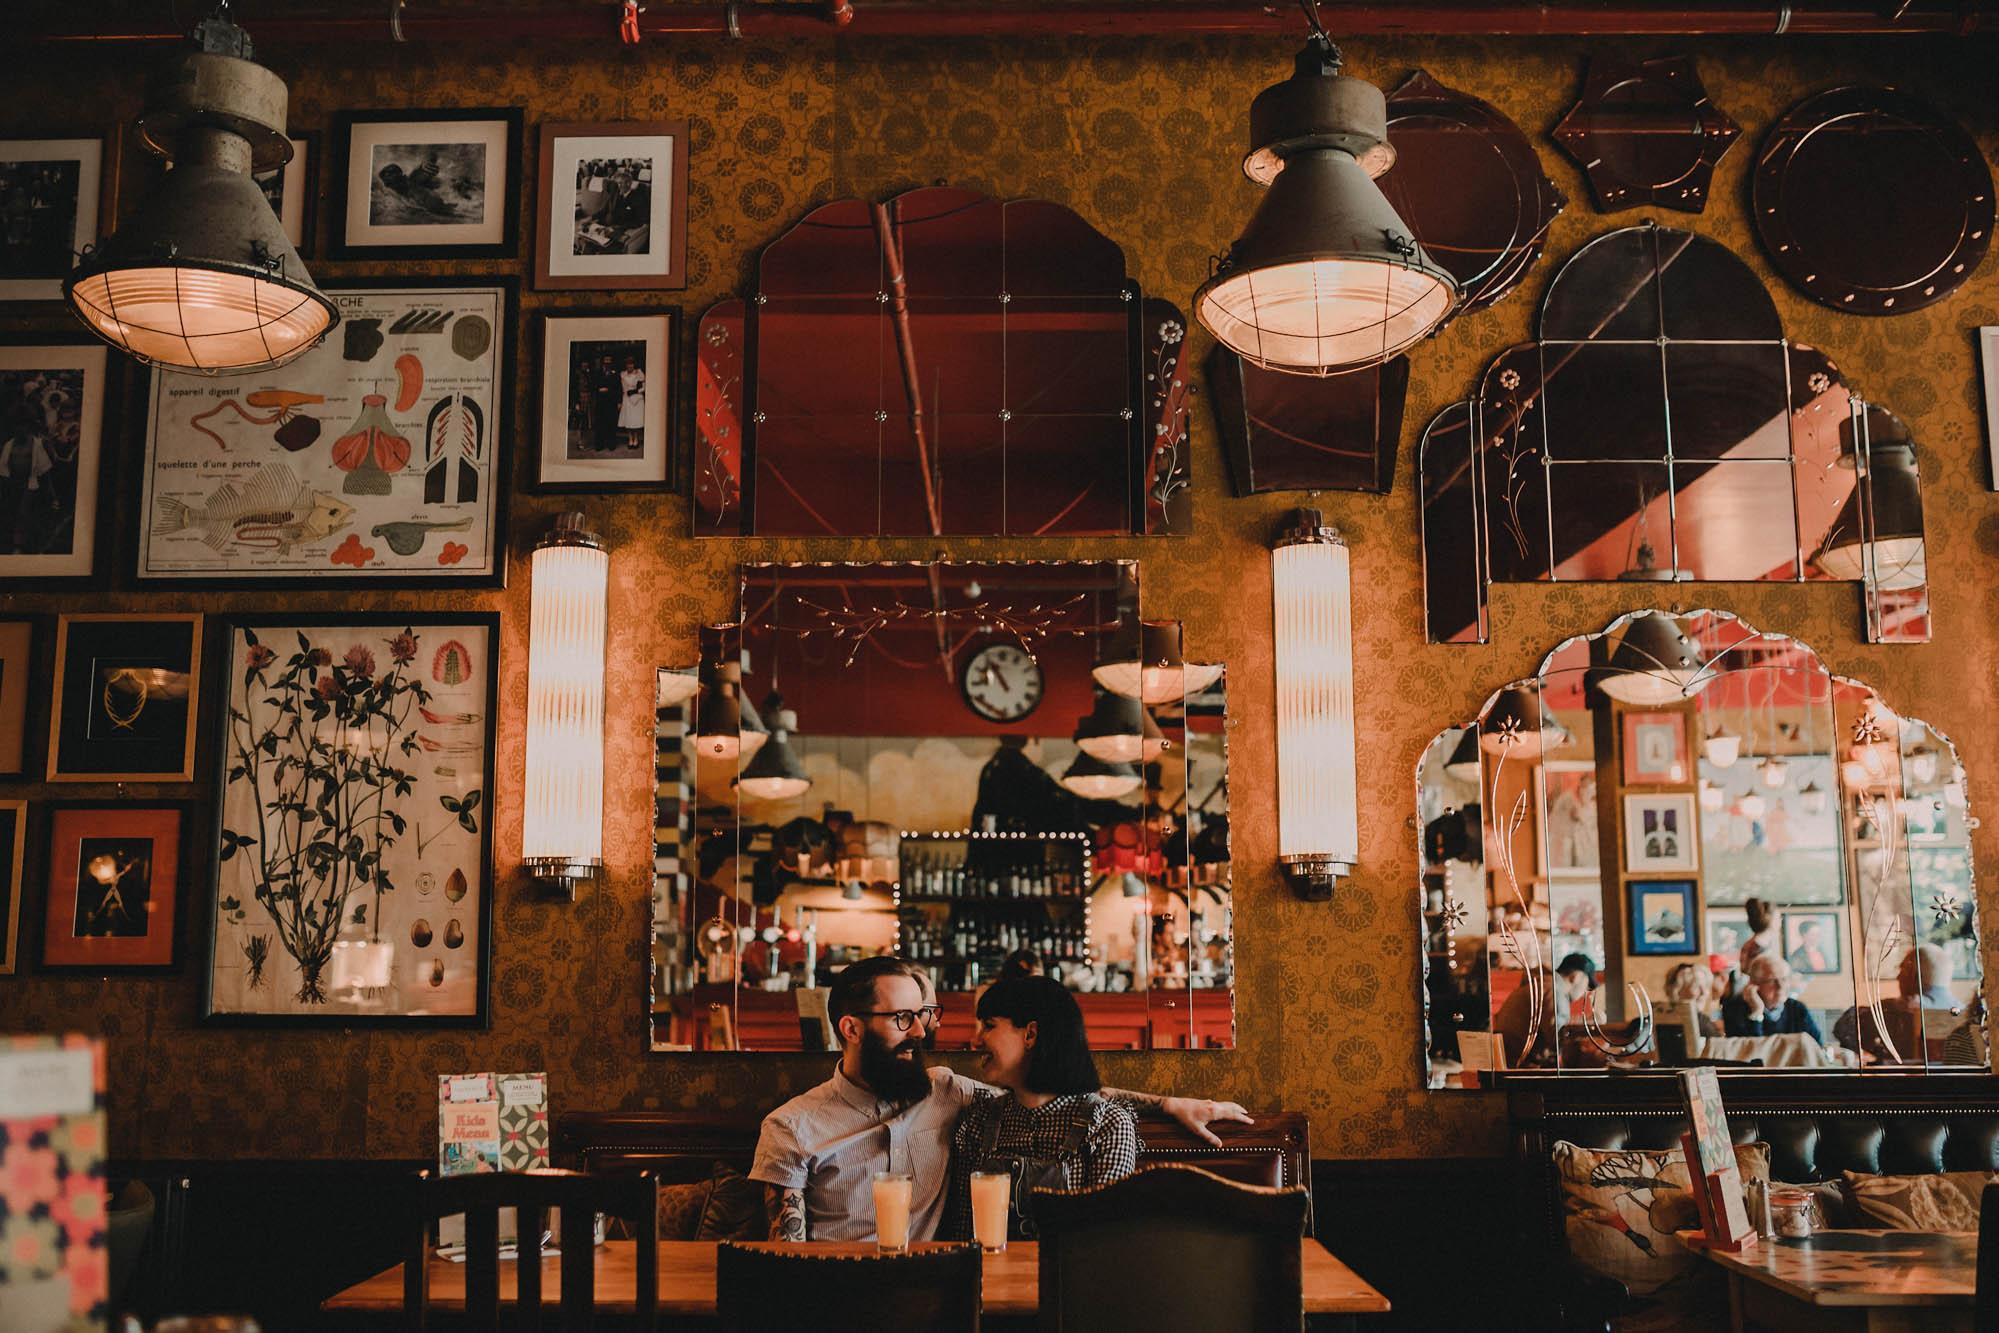 Cafe-Bar-Engagement-Photography37.jpg